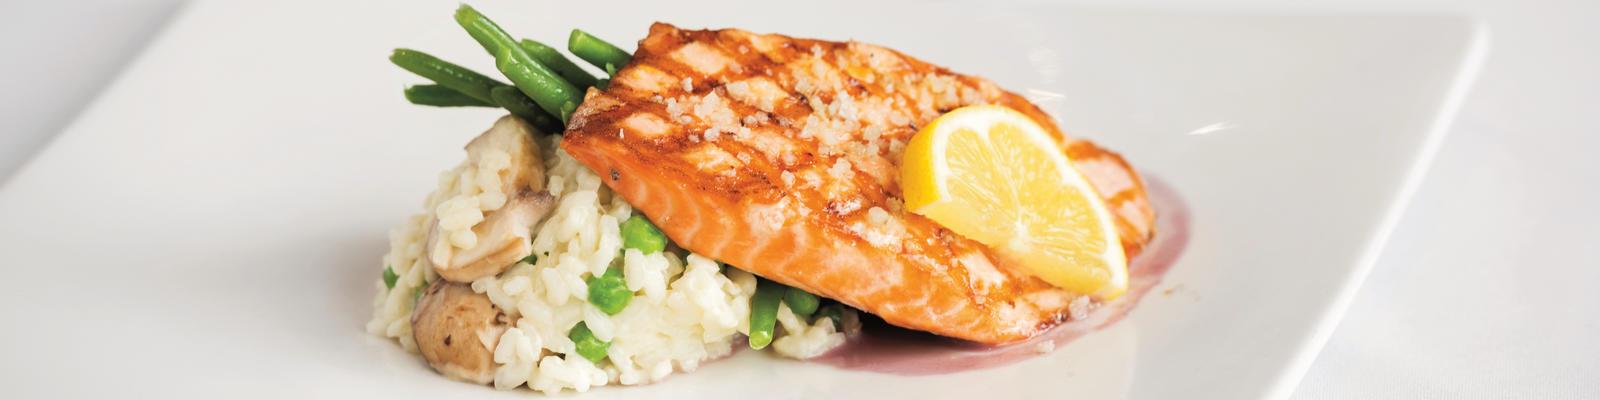 Sea Salt Accented King Salmon from the King Salmon Restaurant in Denai Wilderness Lodge (Photo: Princess Cruises)